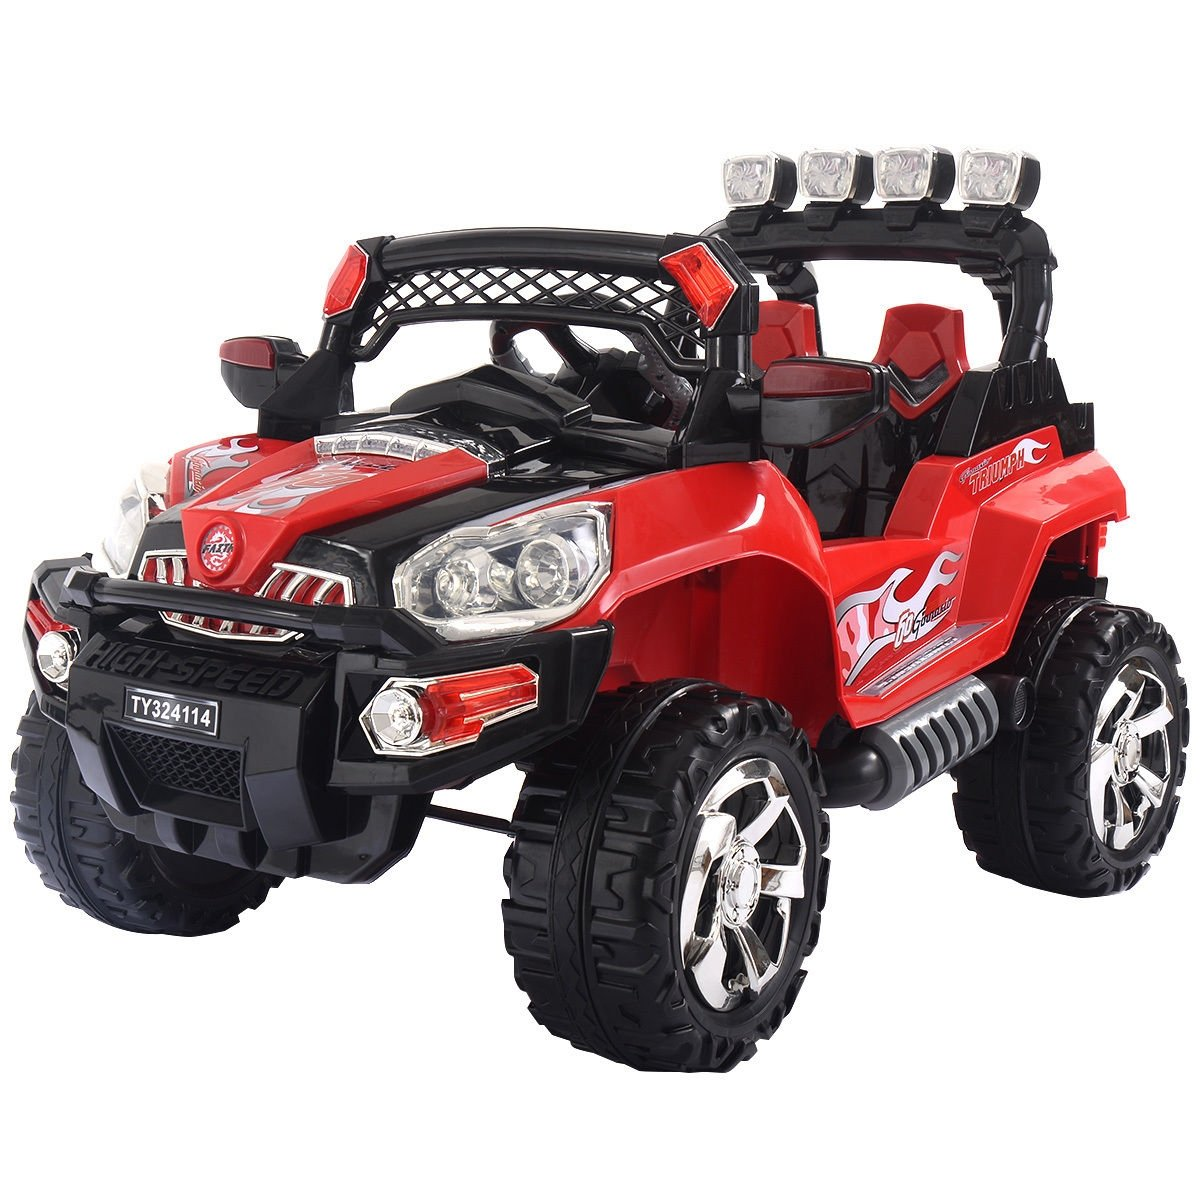 12V Kids Ride On Truck Car SUV RC Remote Control w/LED